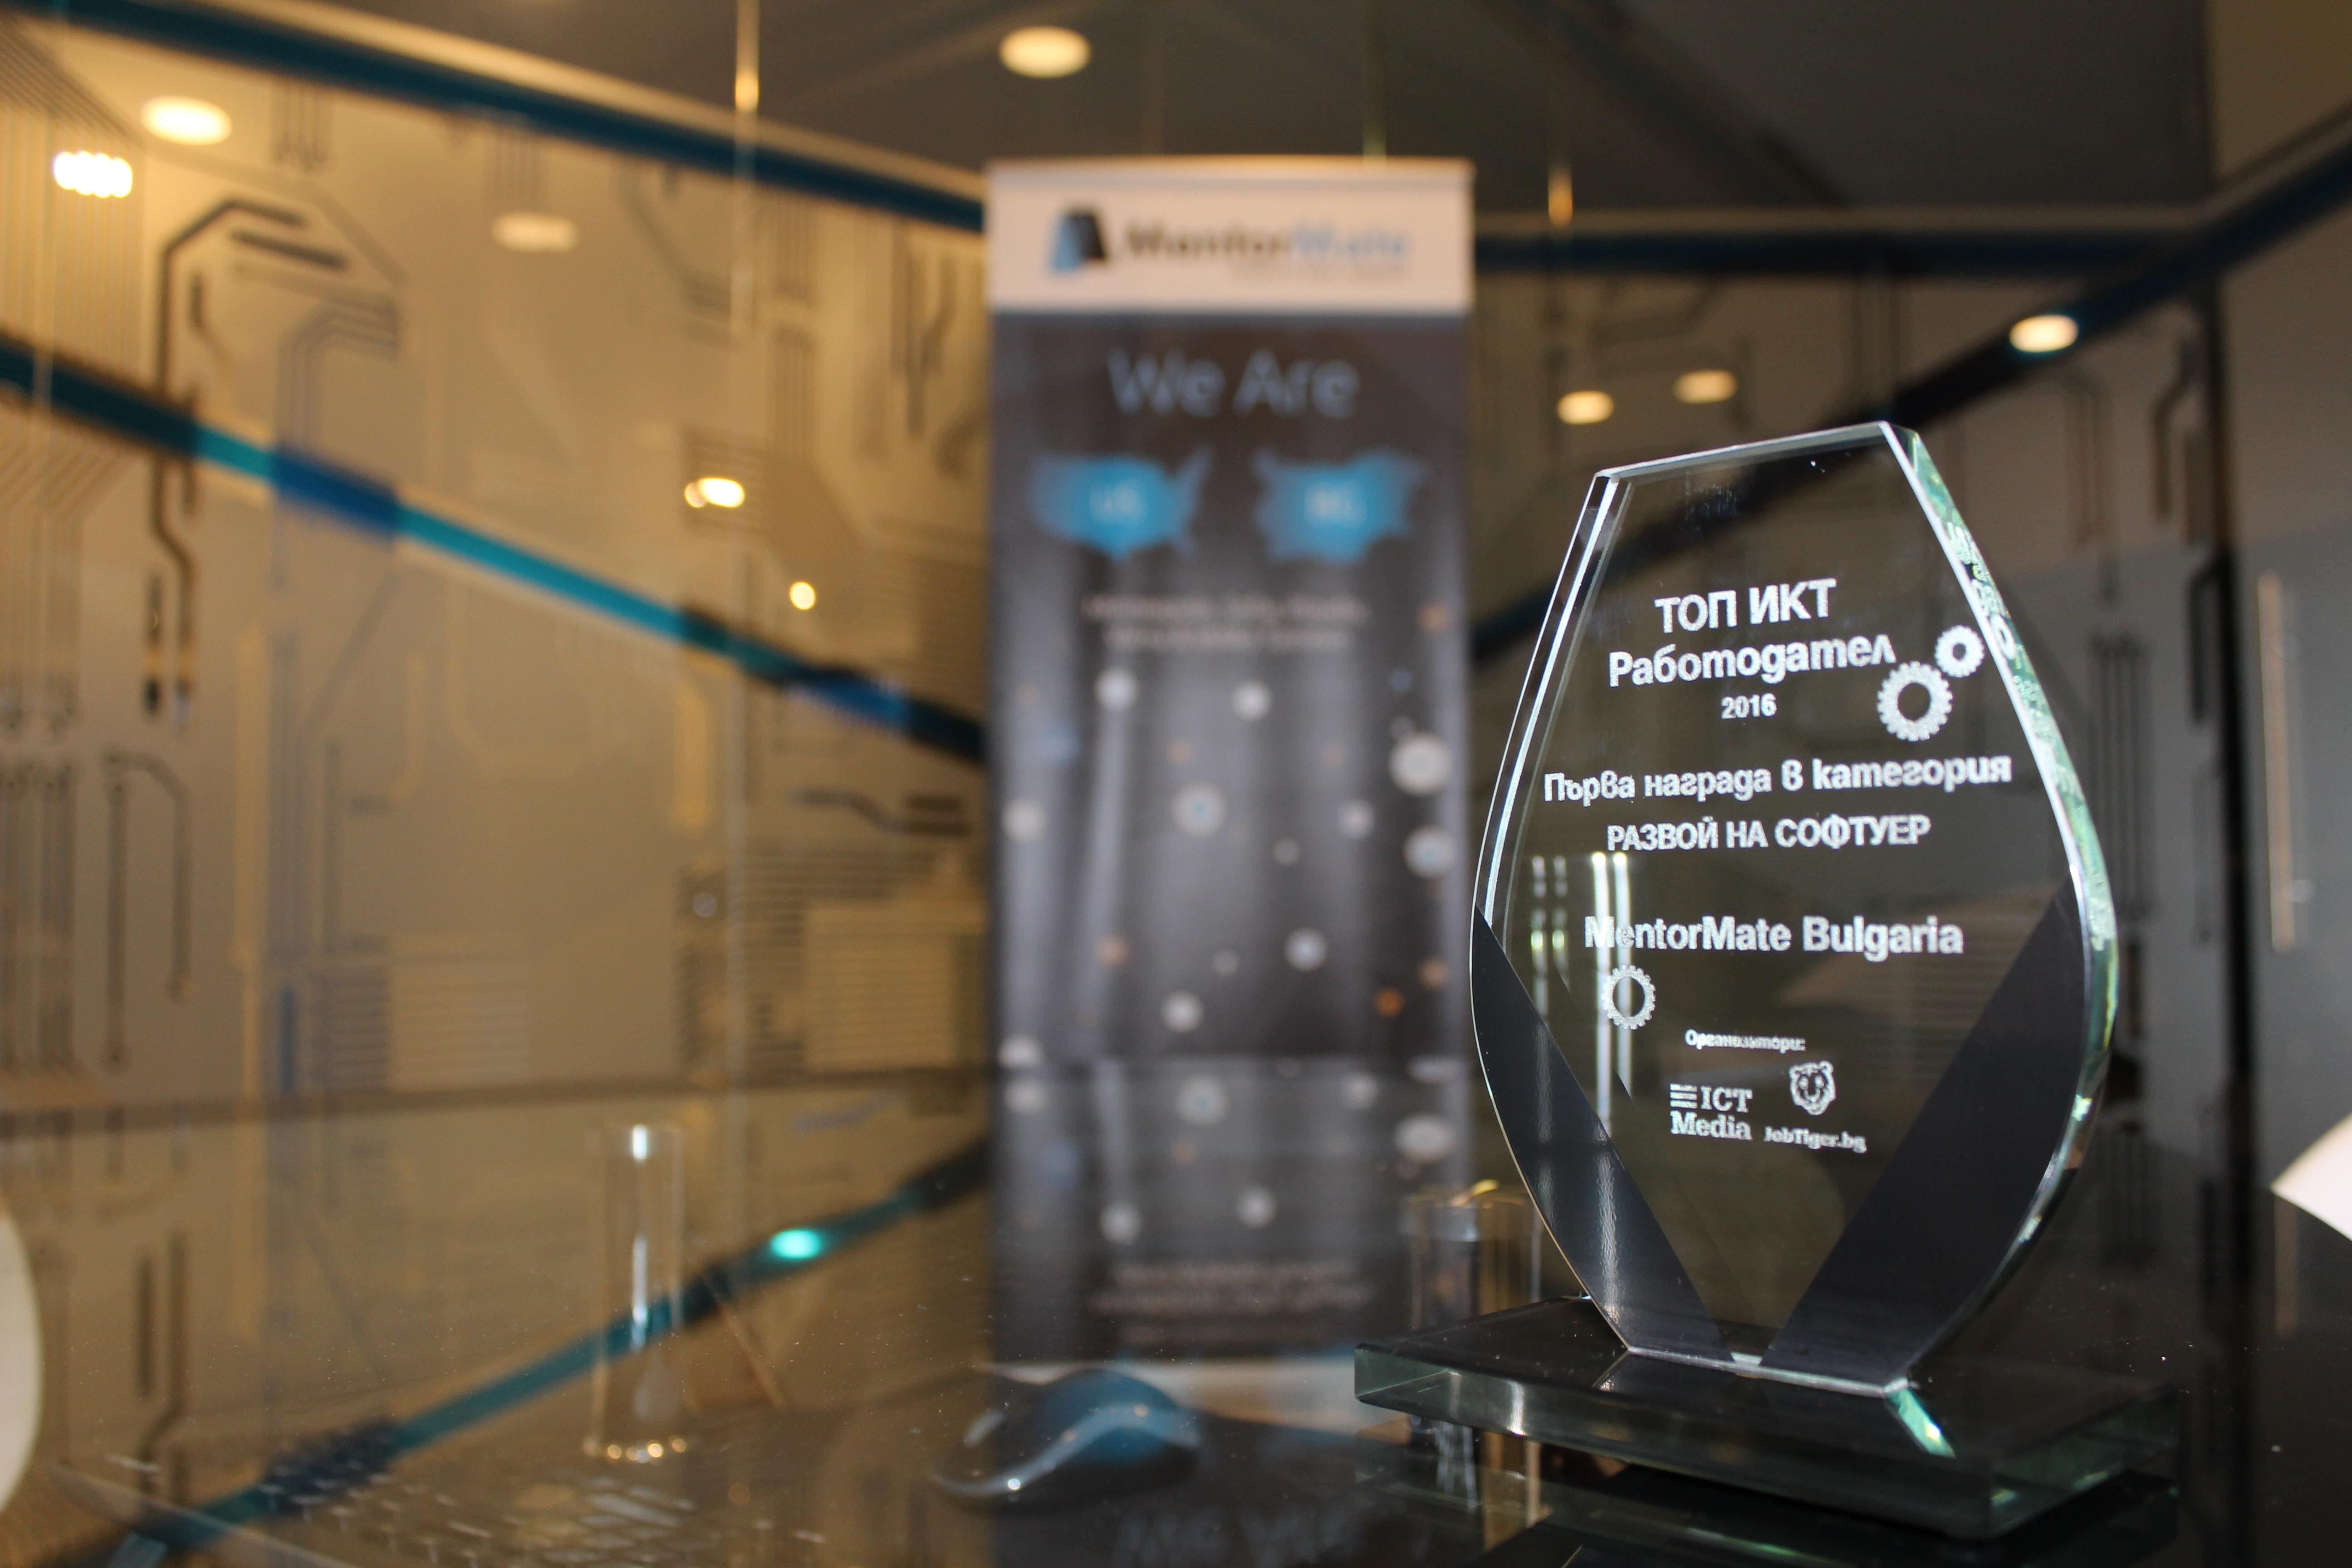 MentorMate Bulgaria | Top ICT Employer Award